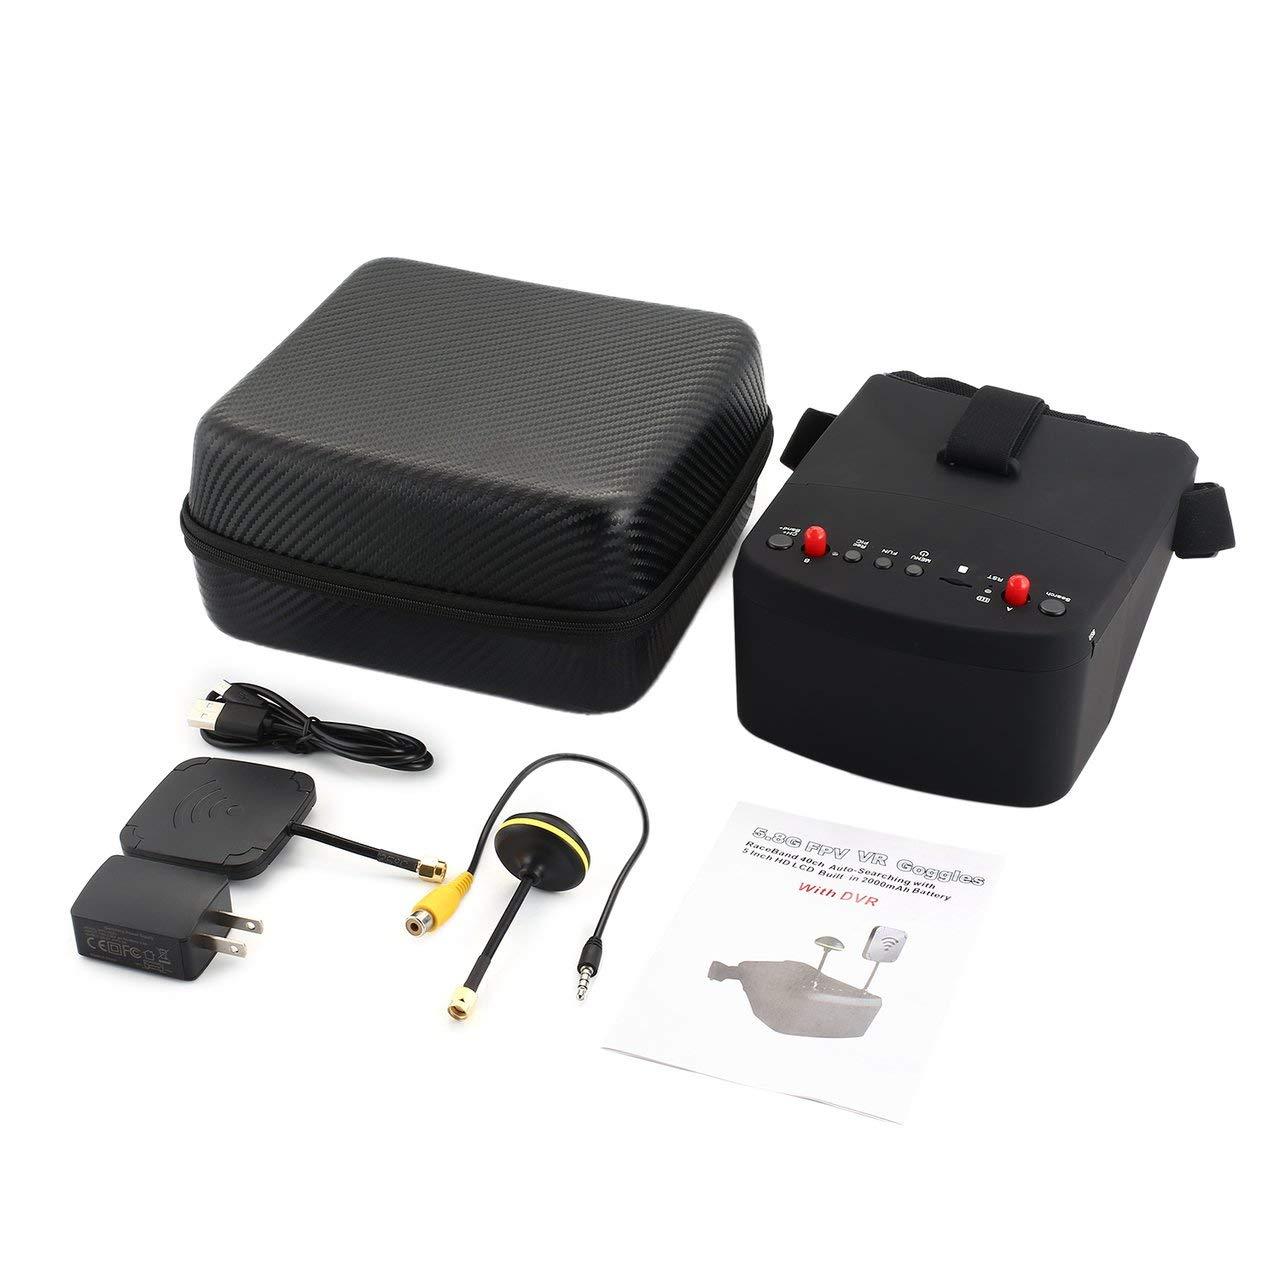 Blackfell ゴーグル5.8G 5in 40CH FPVゴーグルLS-800Dヘッドセットレシーバーモニター付きHD DVRデュアルアンテナRCレーシングドローン用自動検索   B07PMSHG1Q